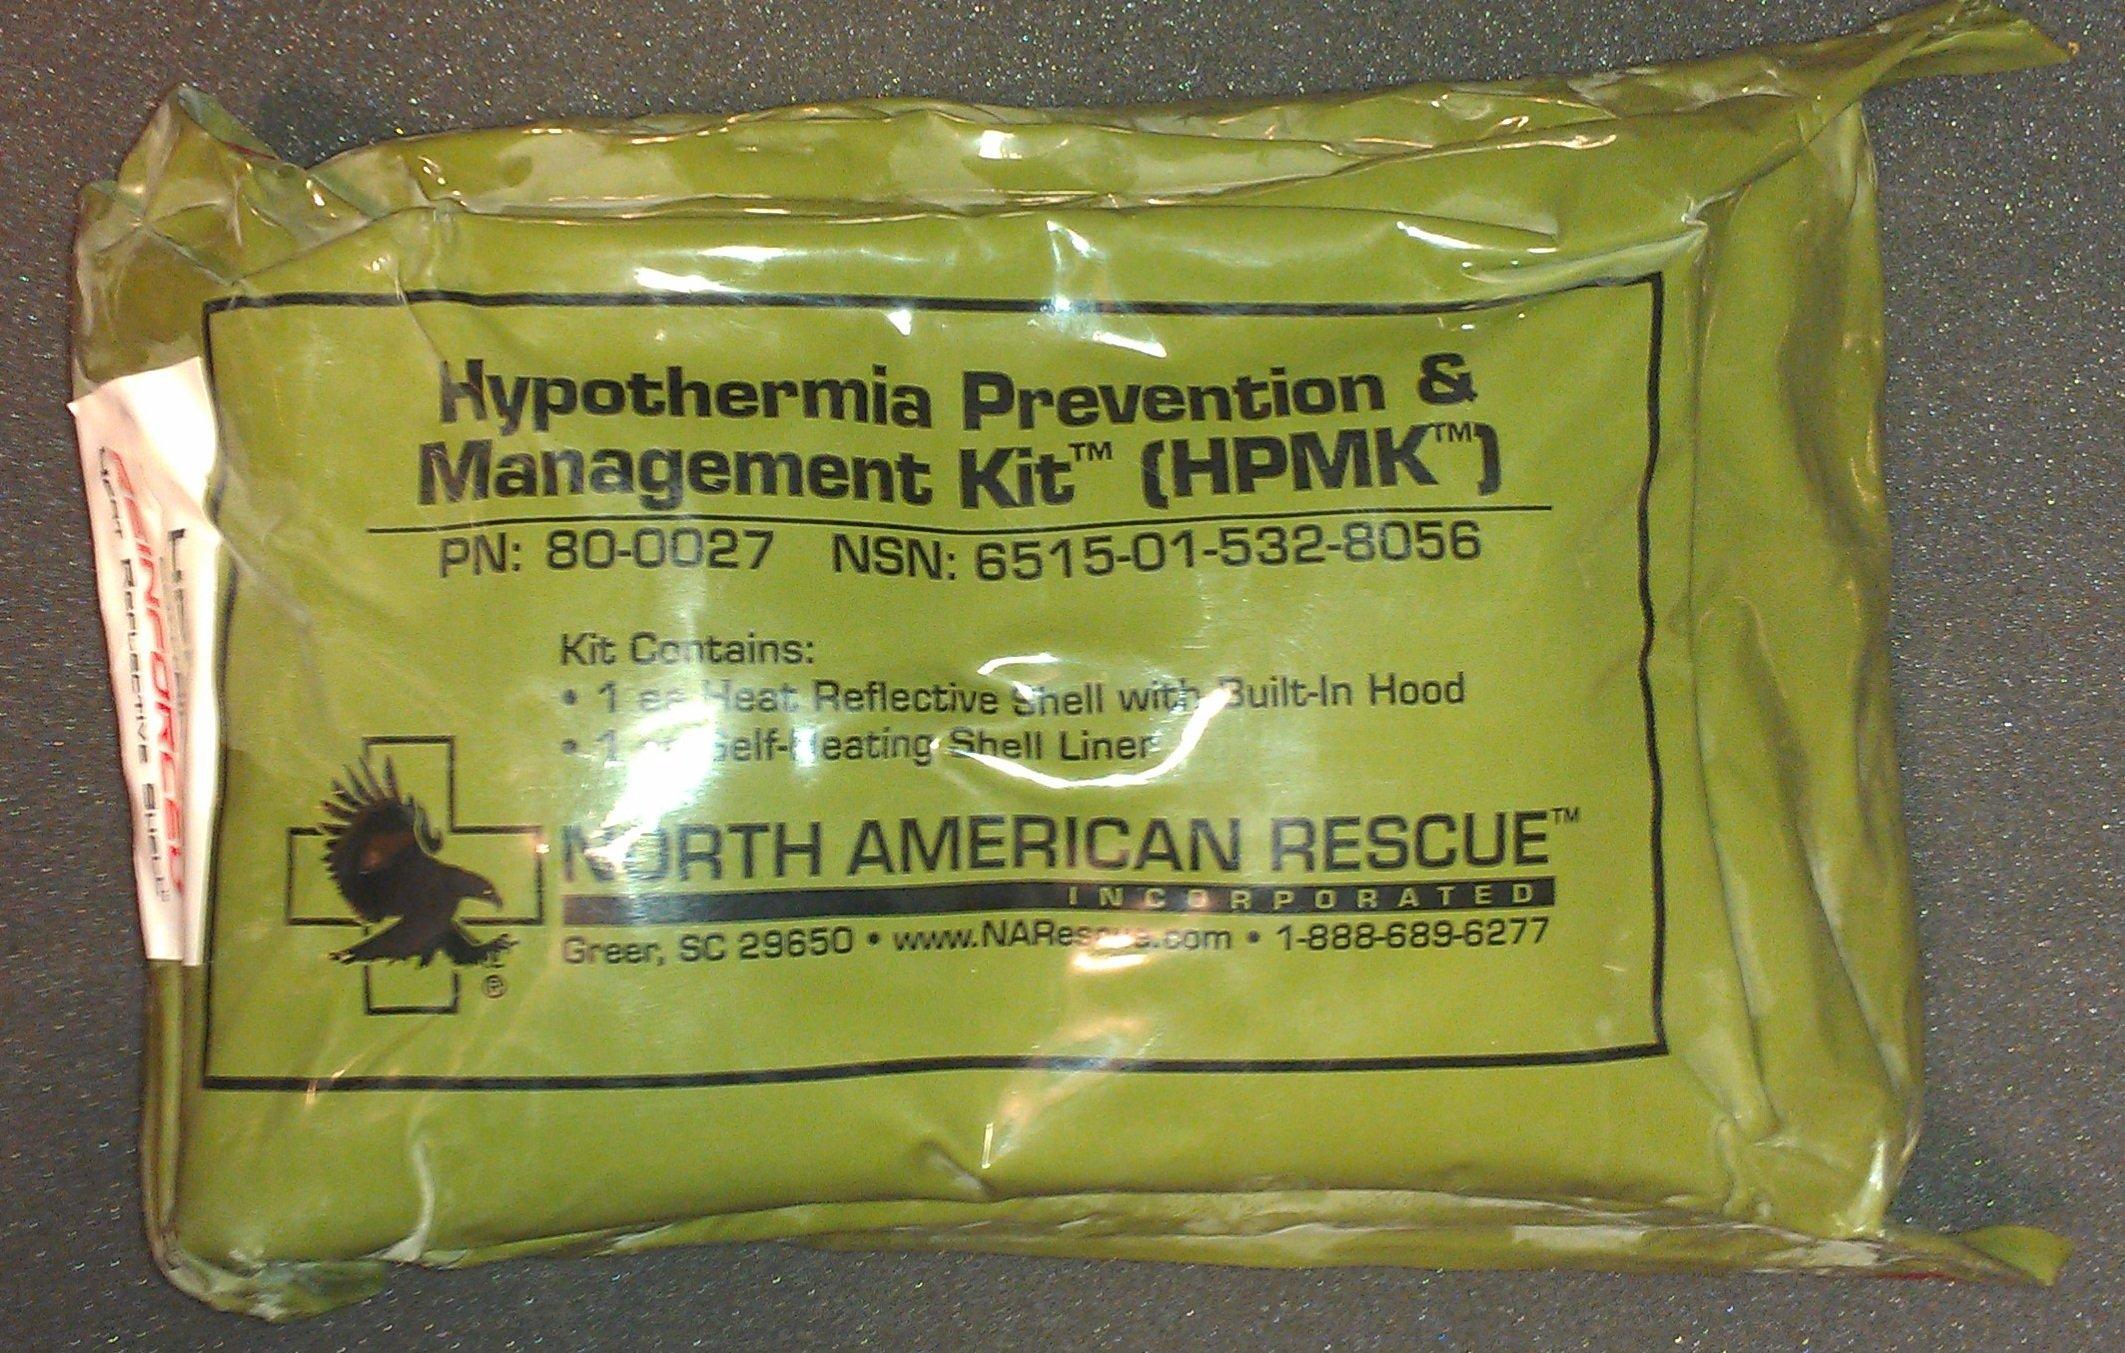 Hypothermia Prevention & Mangament Kit (HPMK)